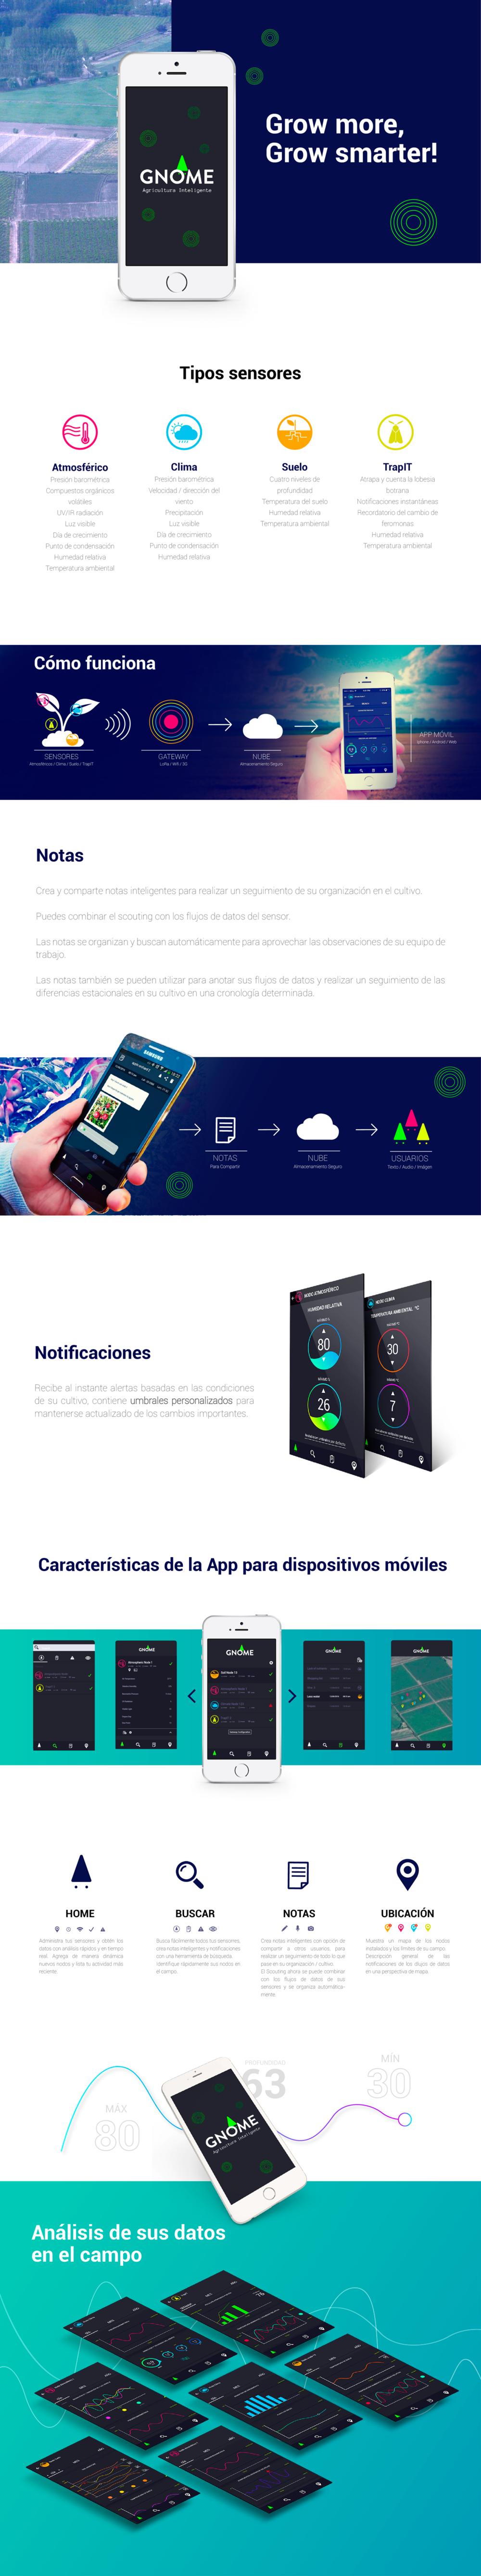 resumen-app-web-02.png